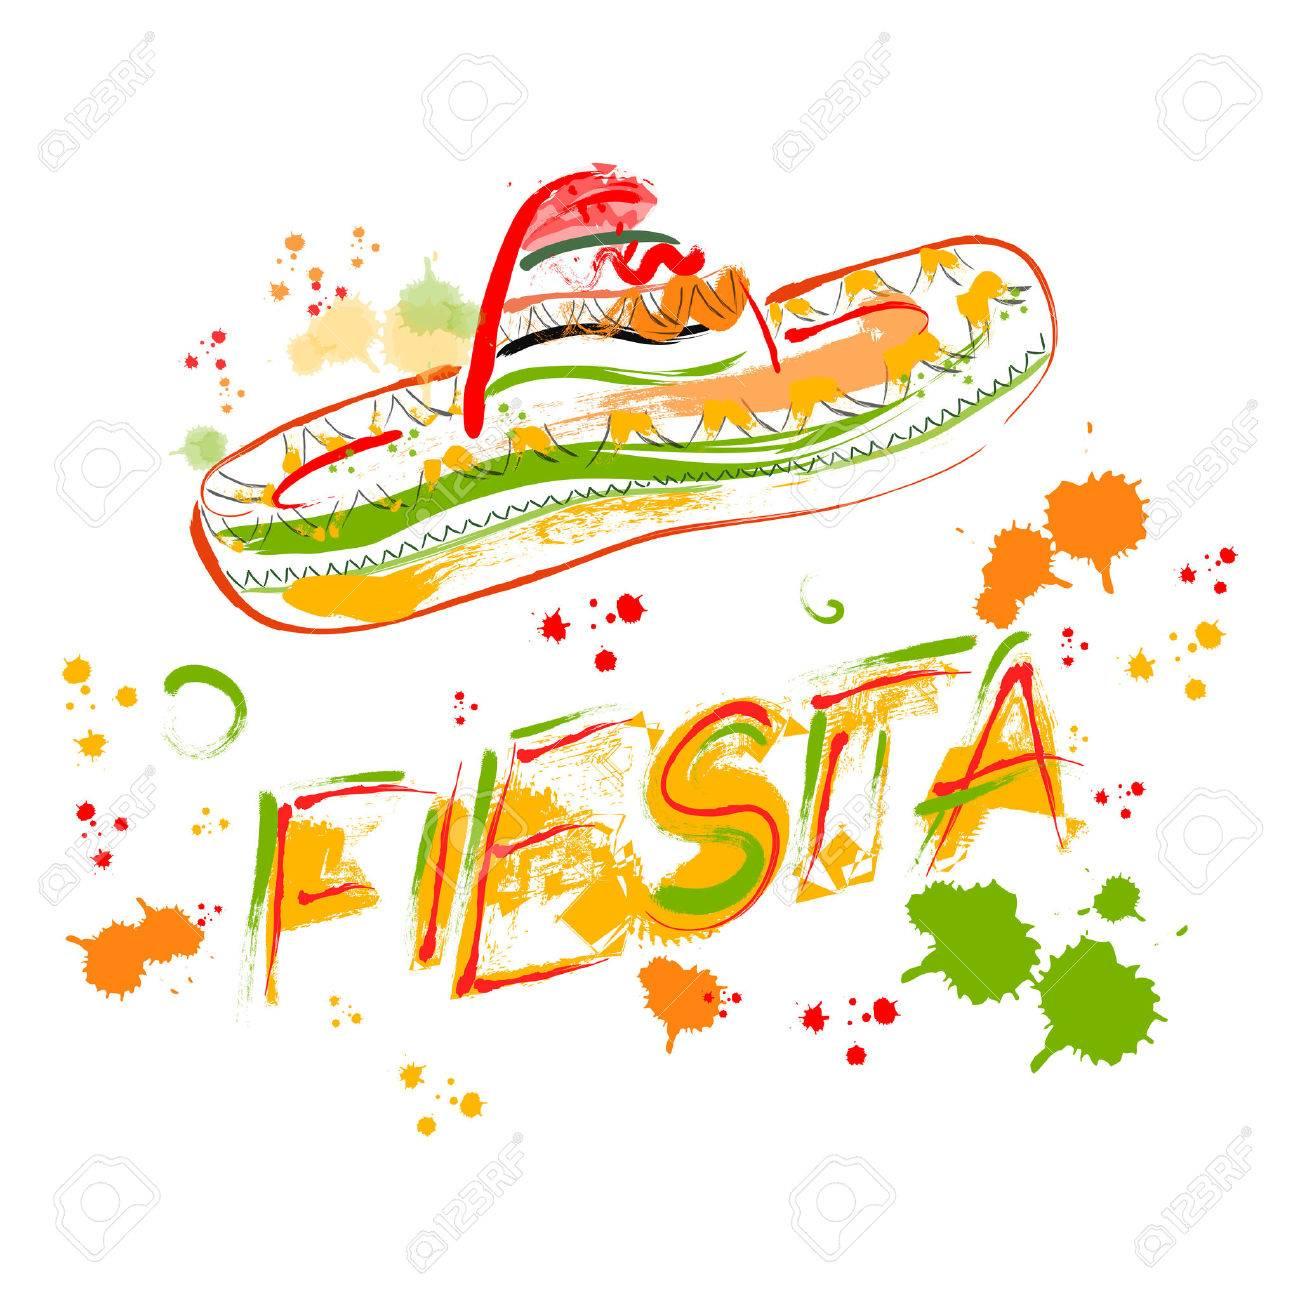 Mexican Fiesta Party Invitation With Sombrero. Hand Drawn Vector ...